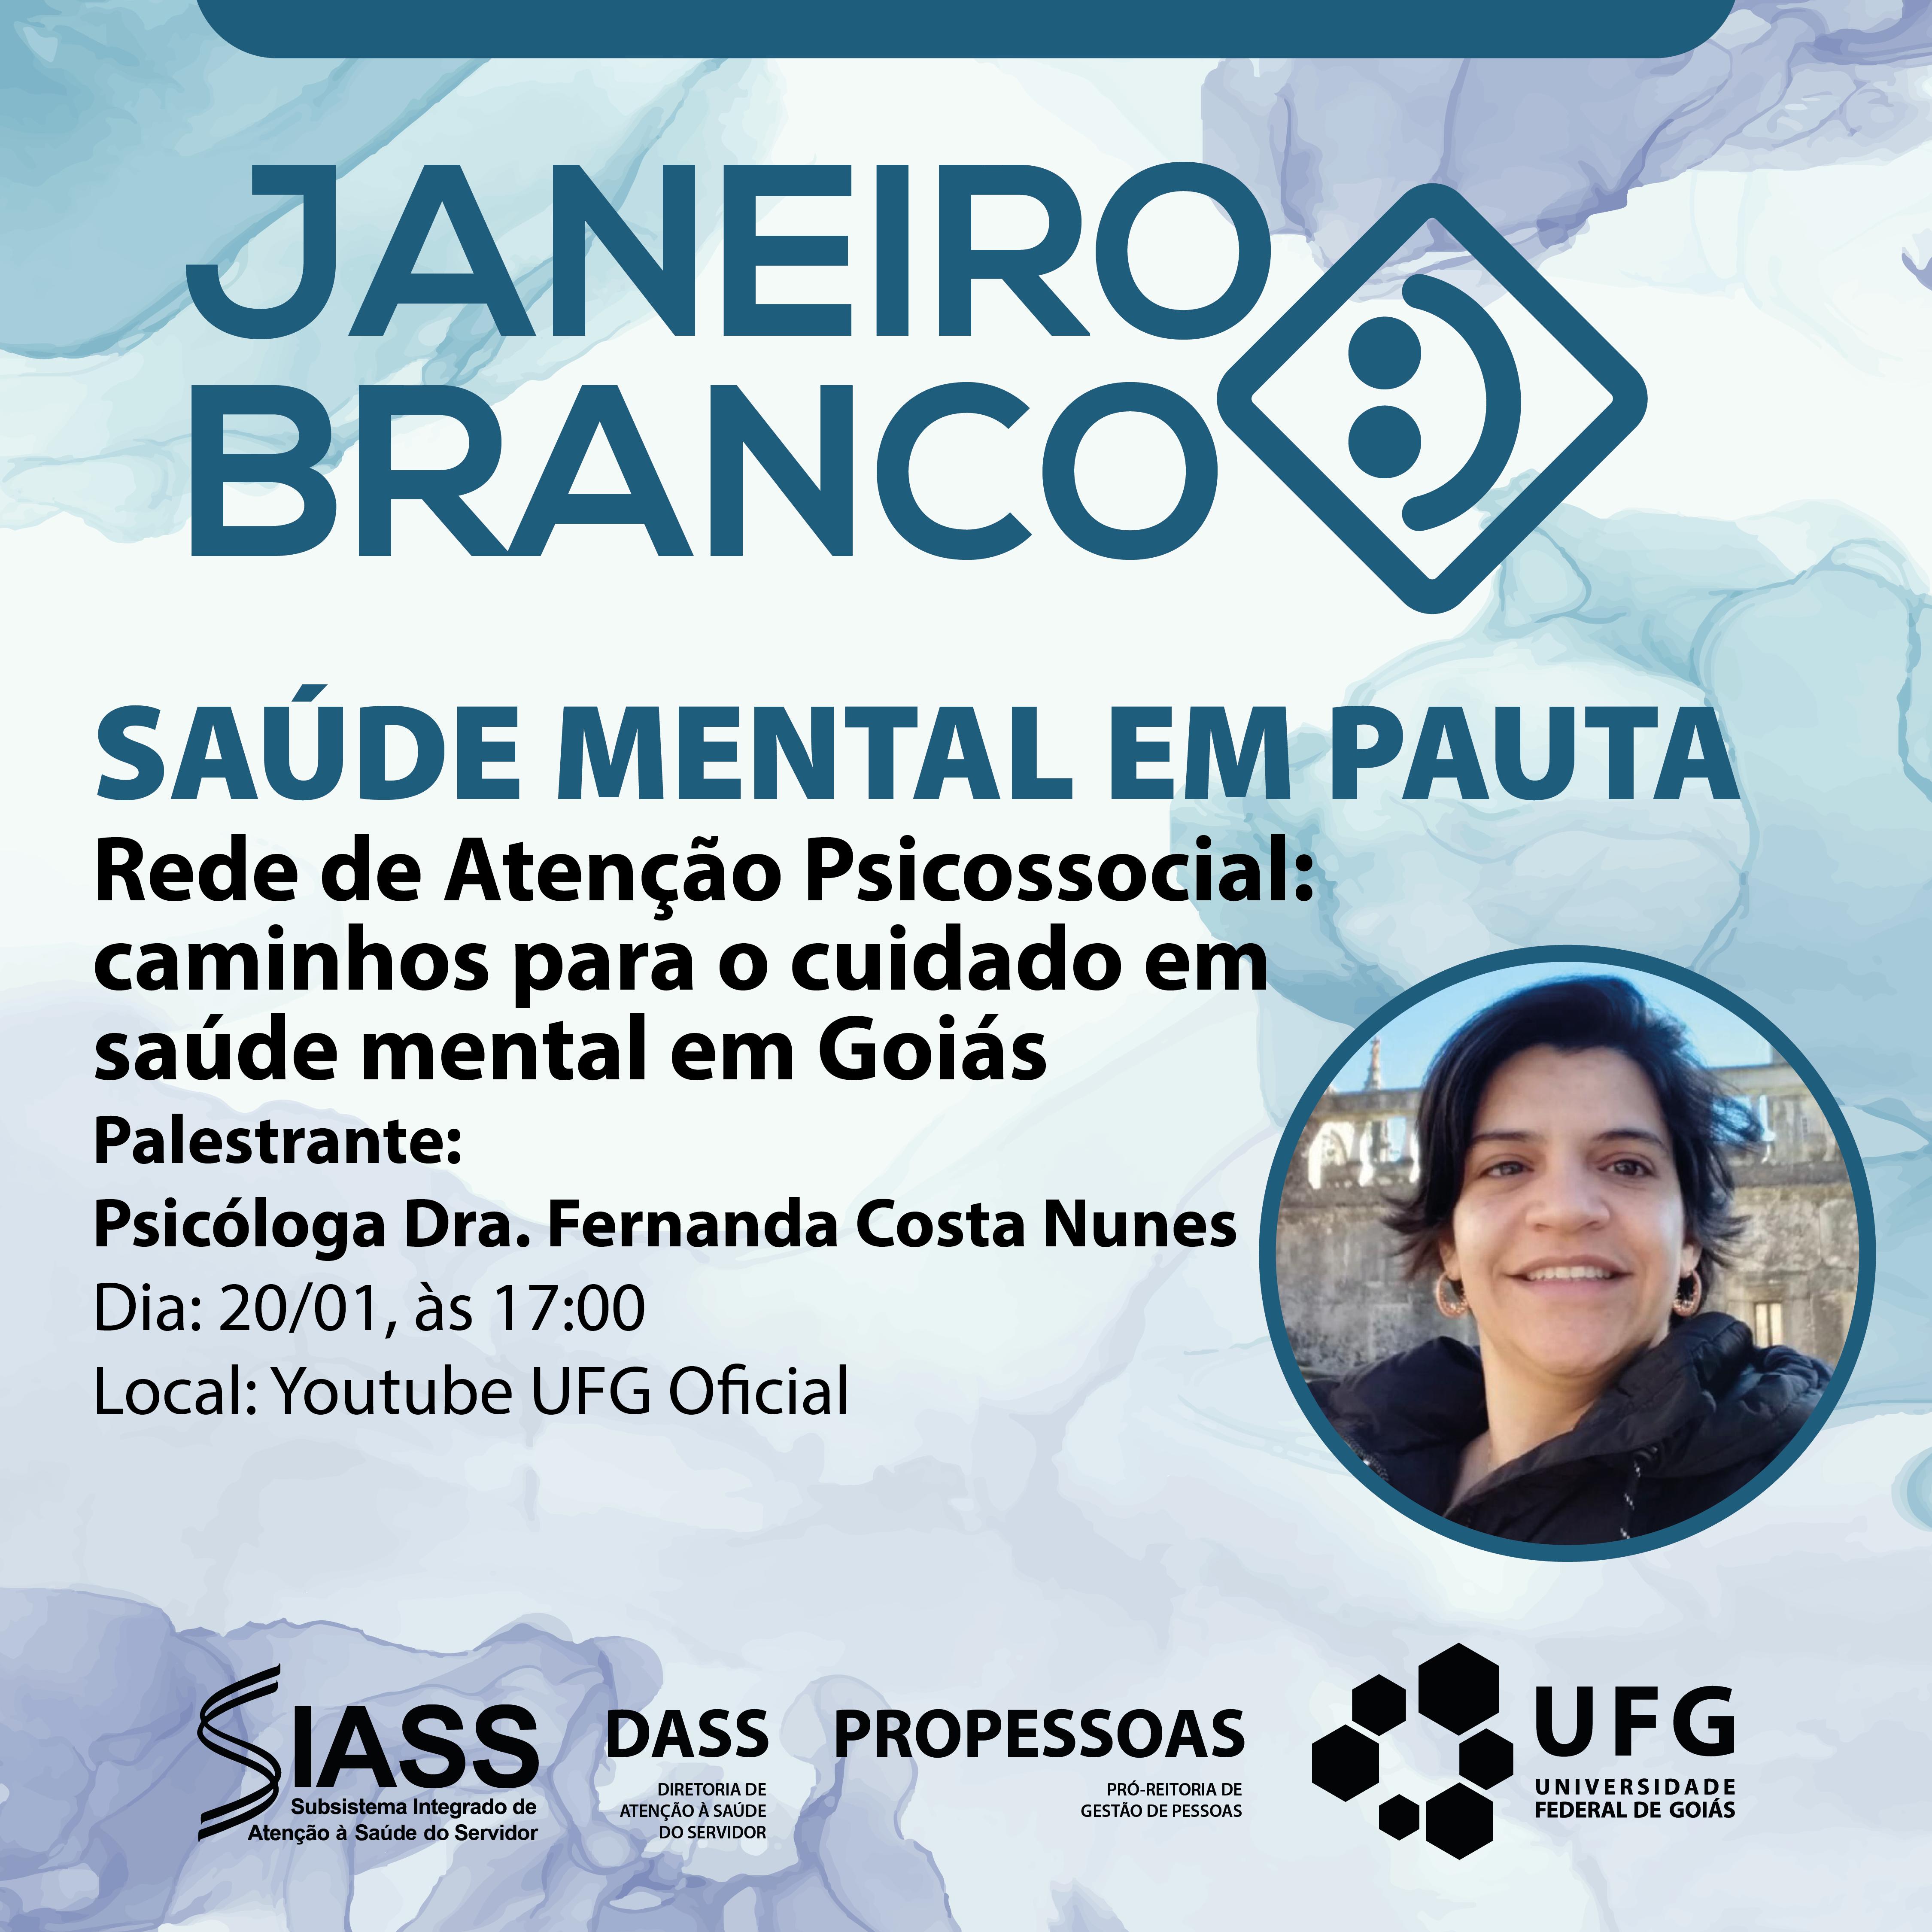 JANEIRO-BRANCO-post_Prancheta_1.png